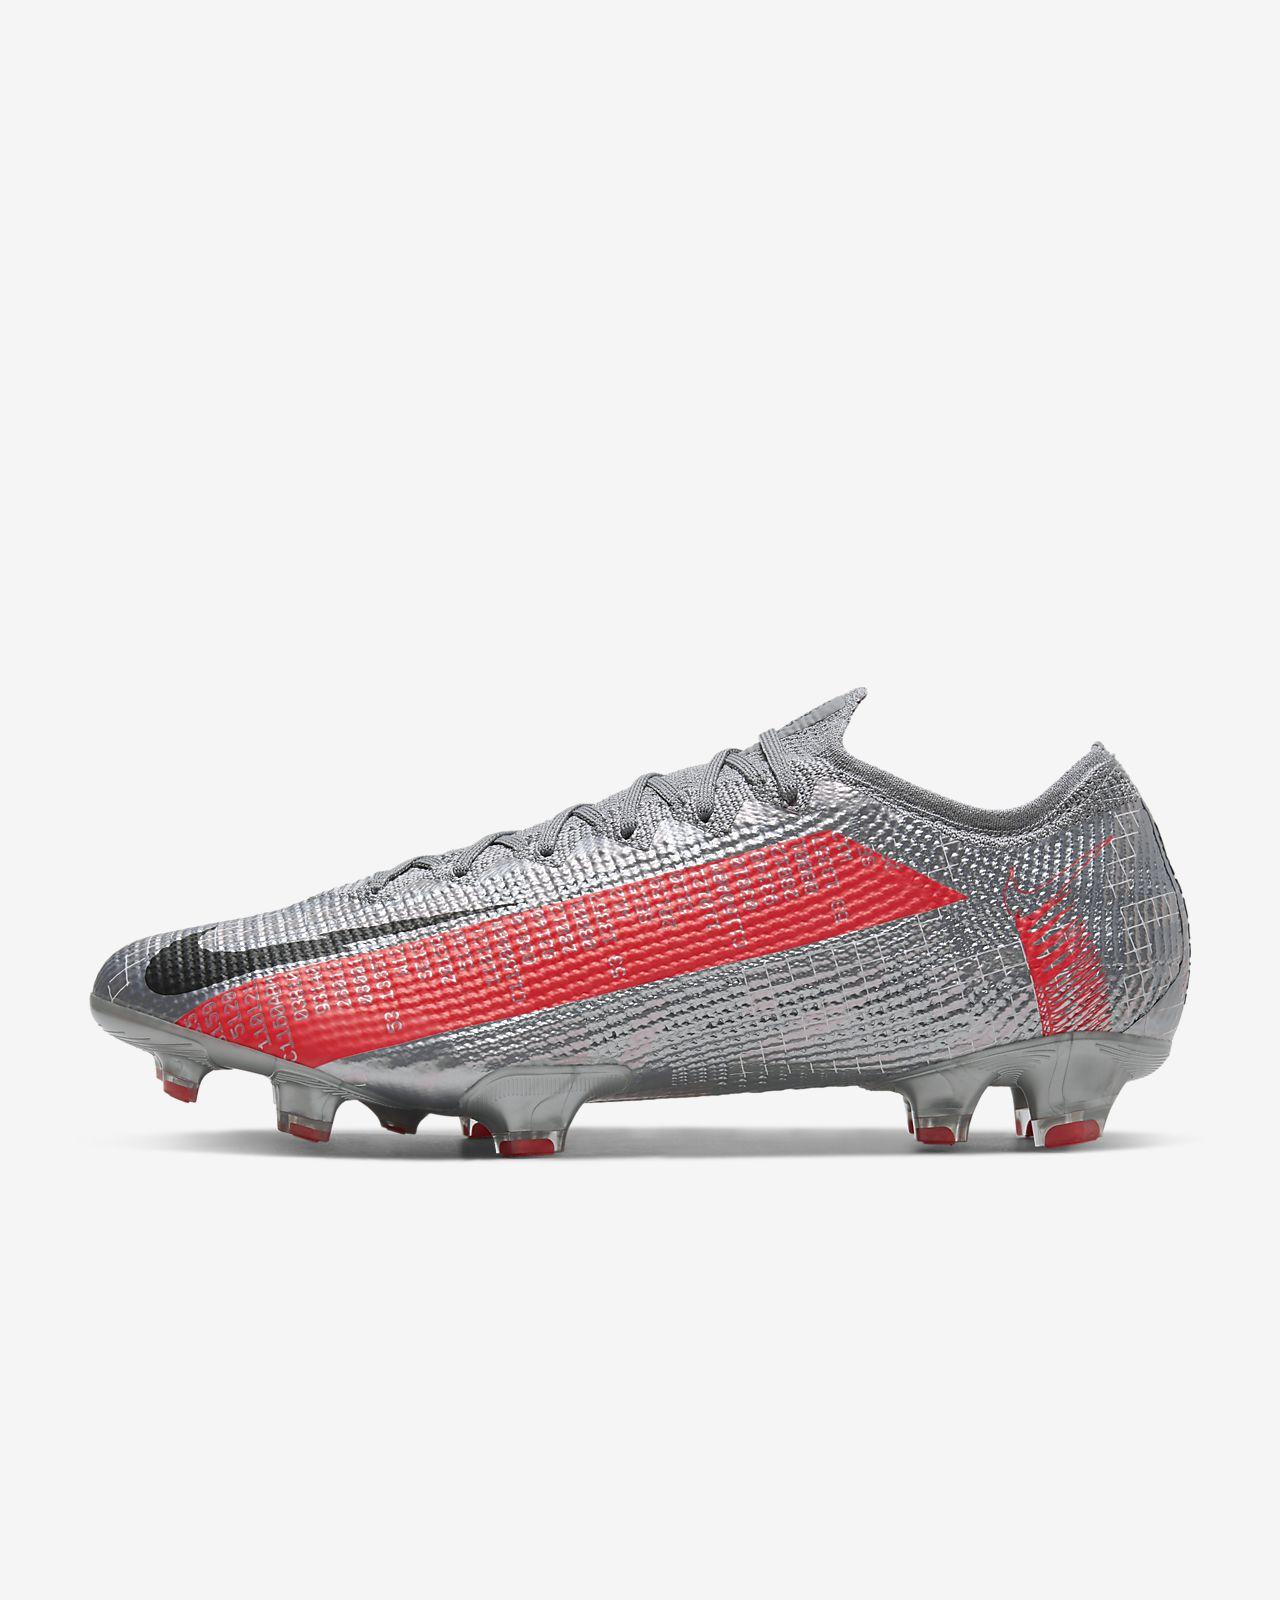 Nike Mercurial Größe 40,5 Fußballschuhe Sockenschuhe